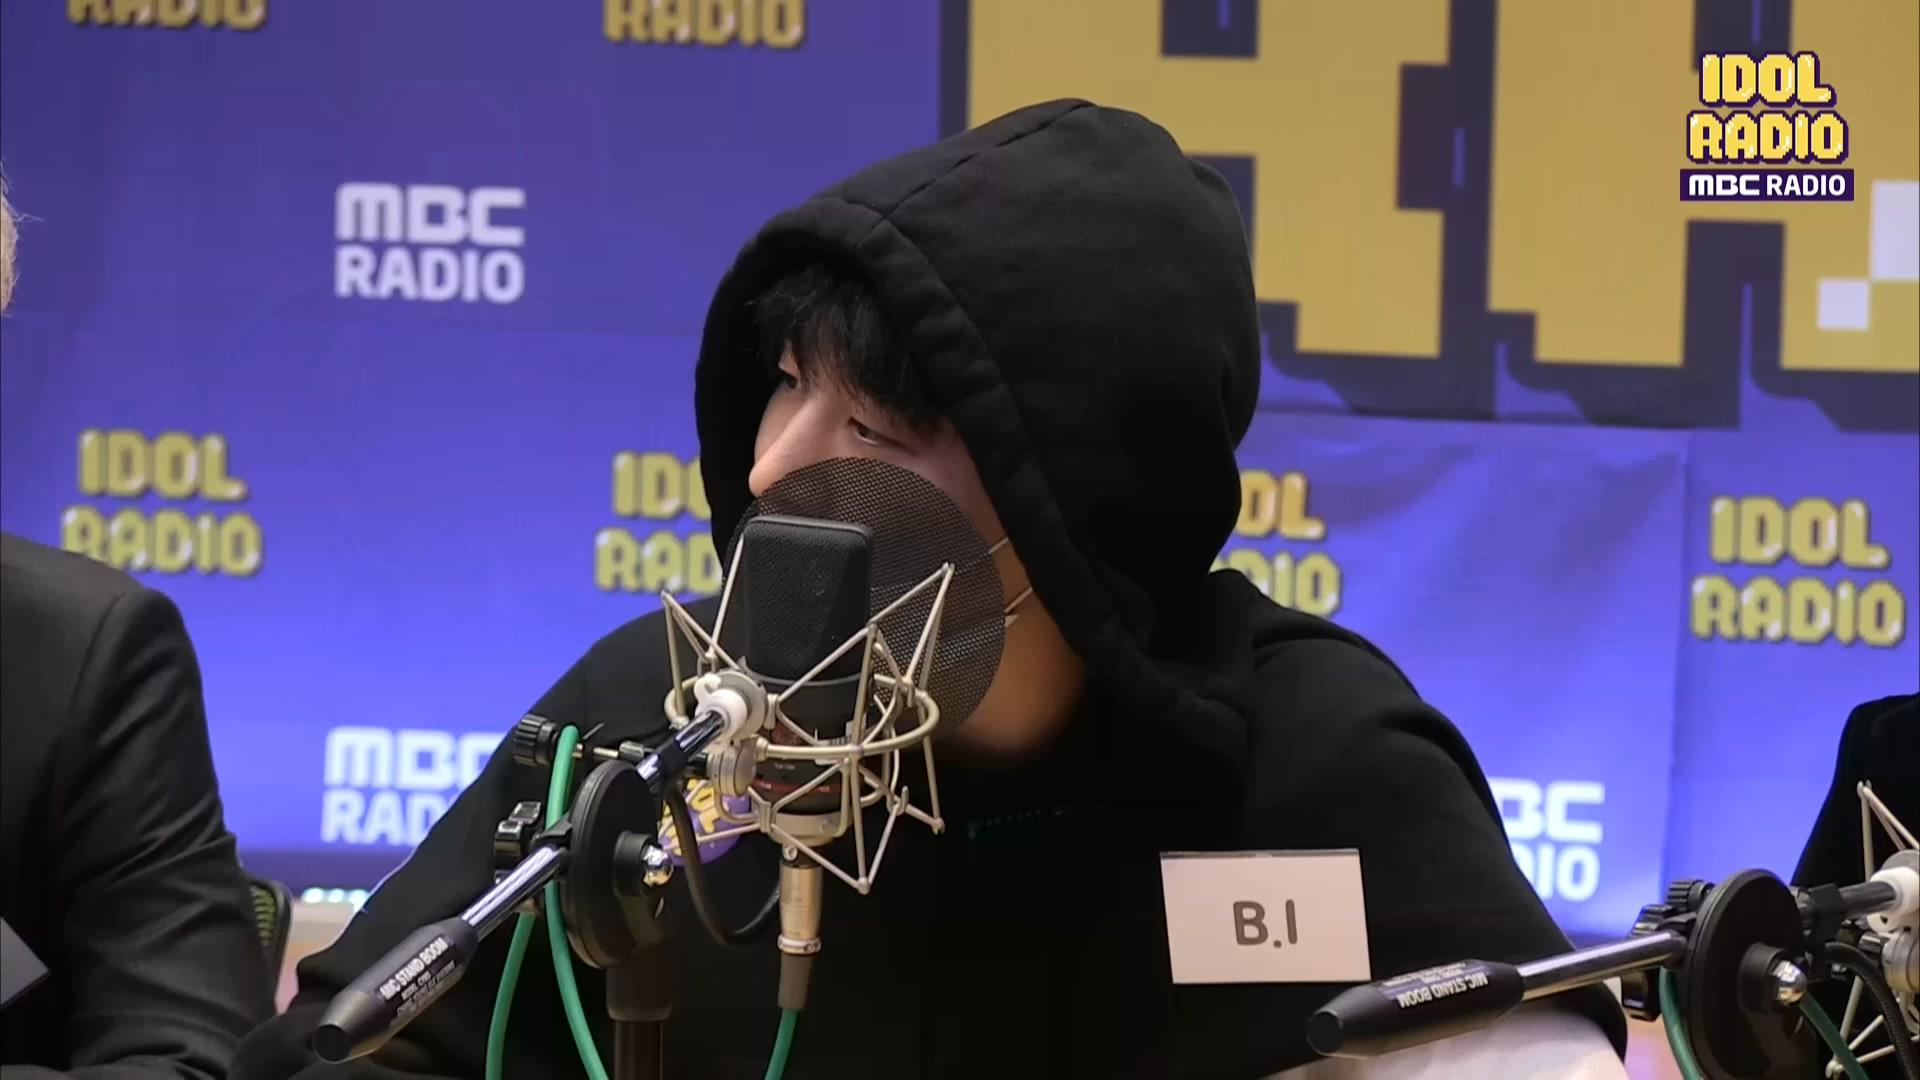 iKON의 컴백 소감 (FT. 안무)